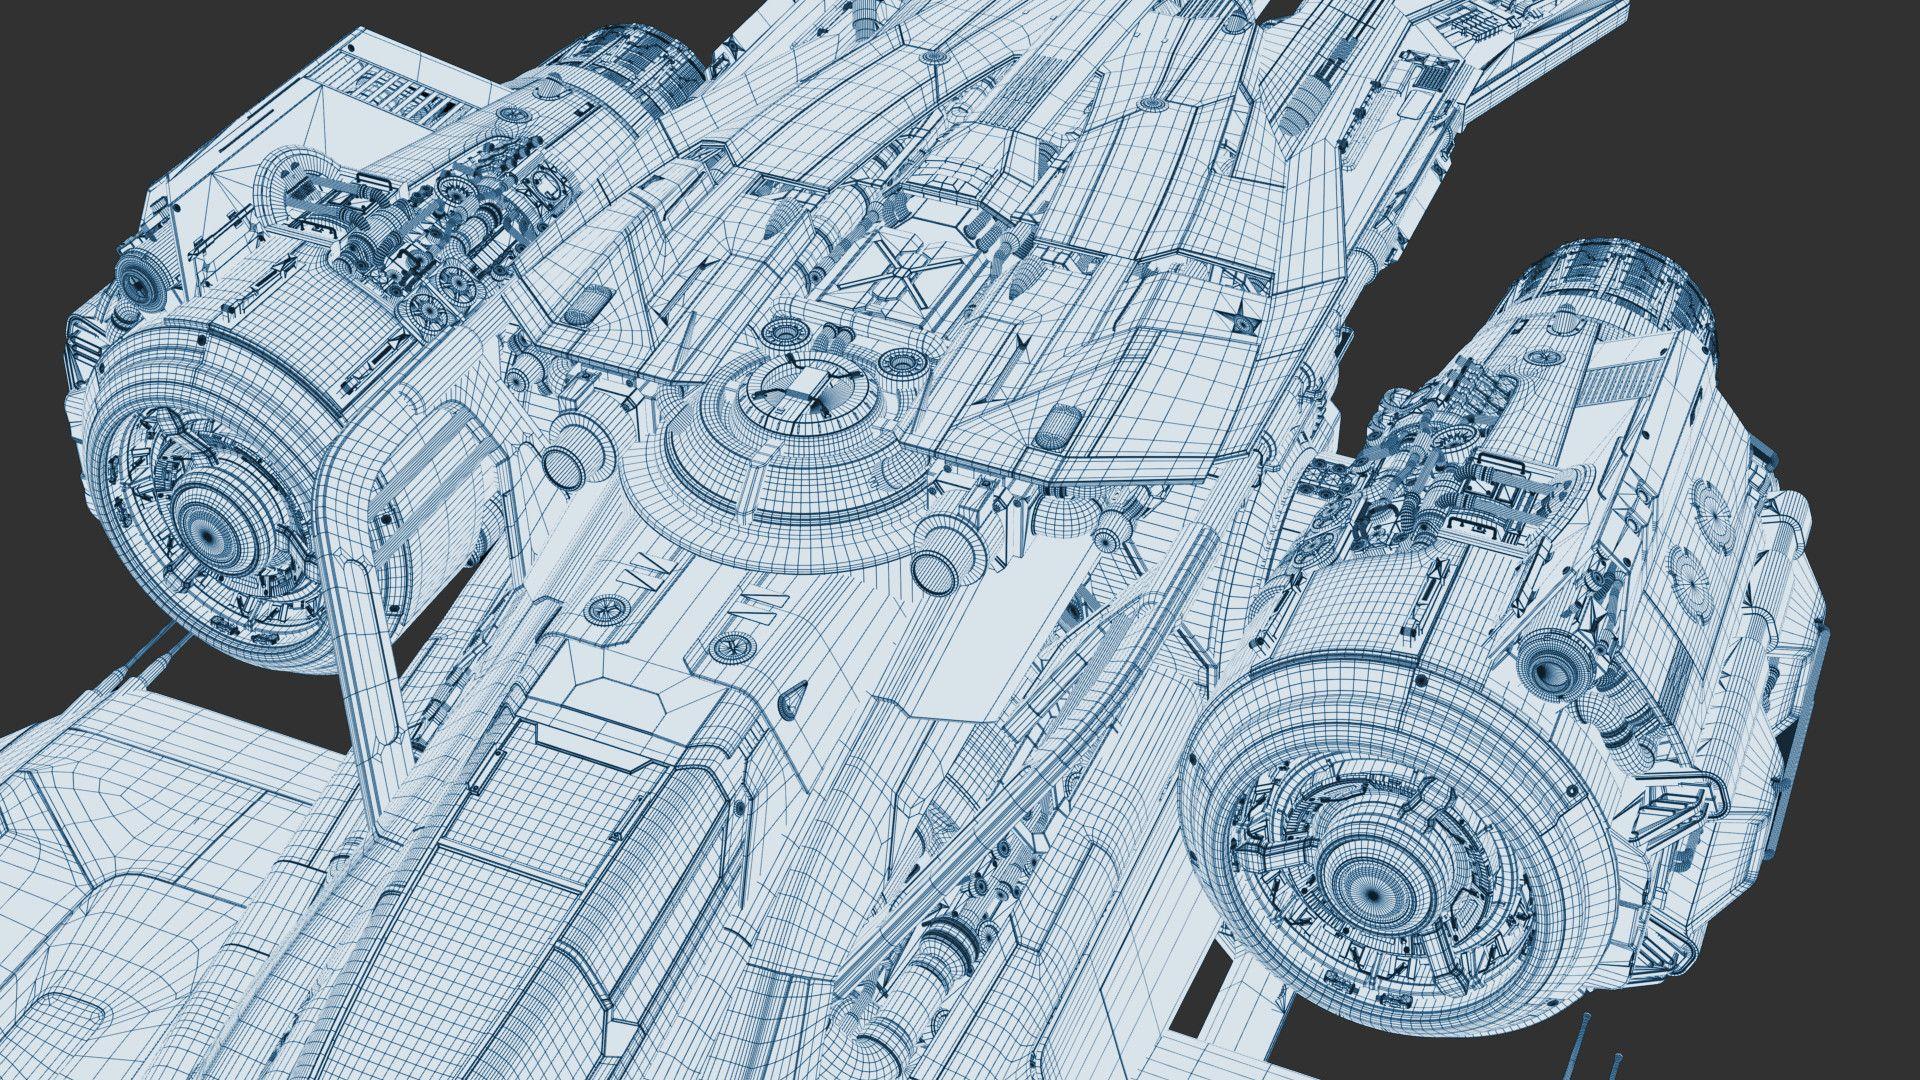 https://www.artstation.com/artwork/1VPmq | Concept sci-fi ships ...